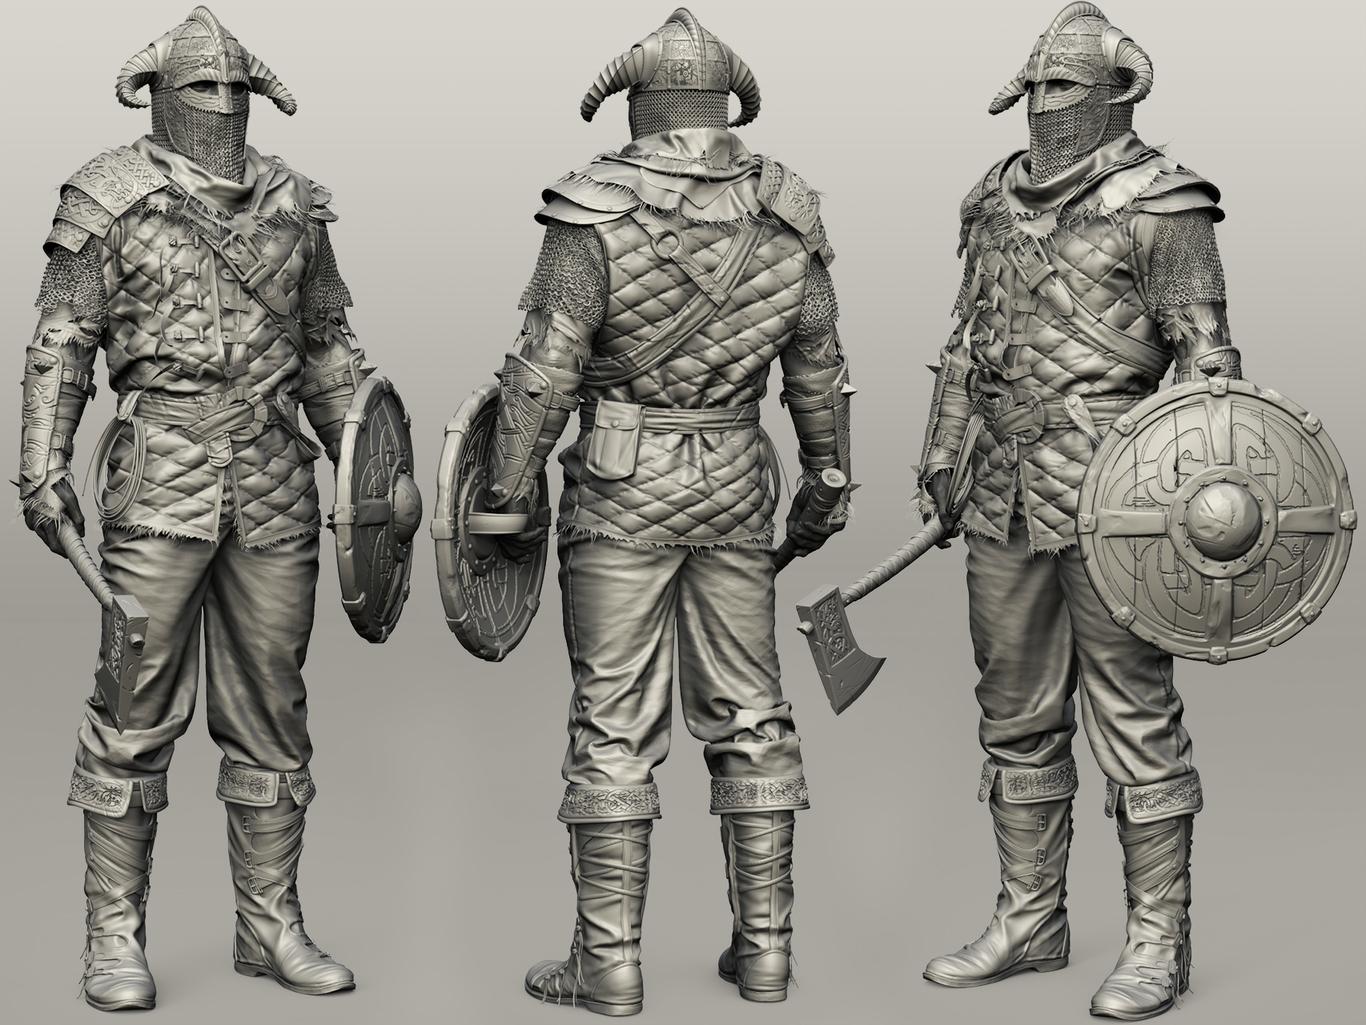 Baldasseroni scandinavian warrior 1 02d4daf0 j2ax